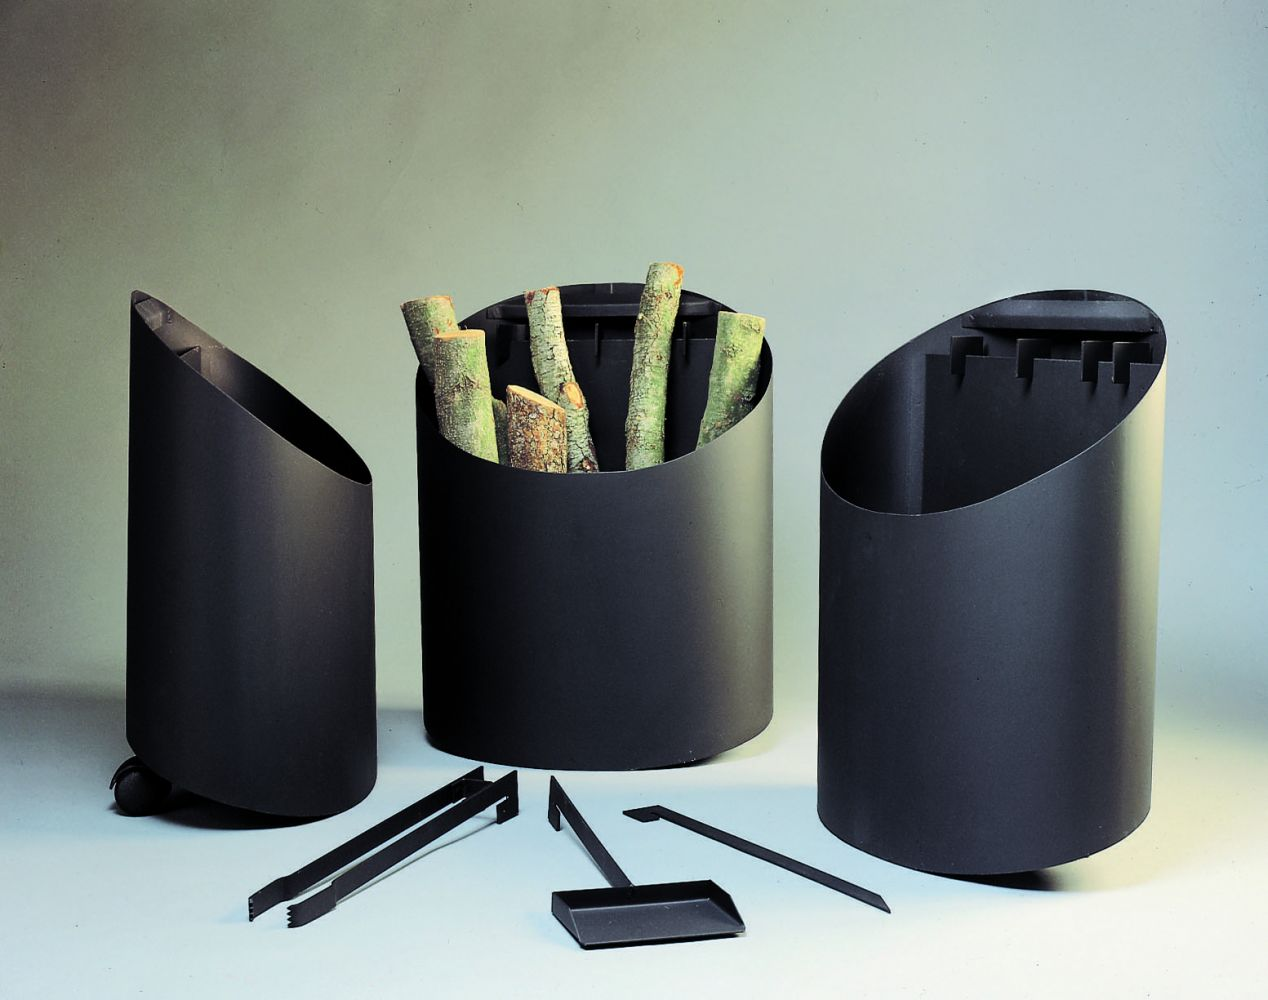 porta-troncos chimenea design